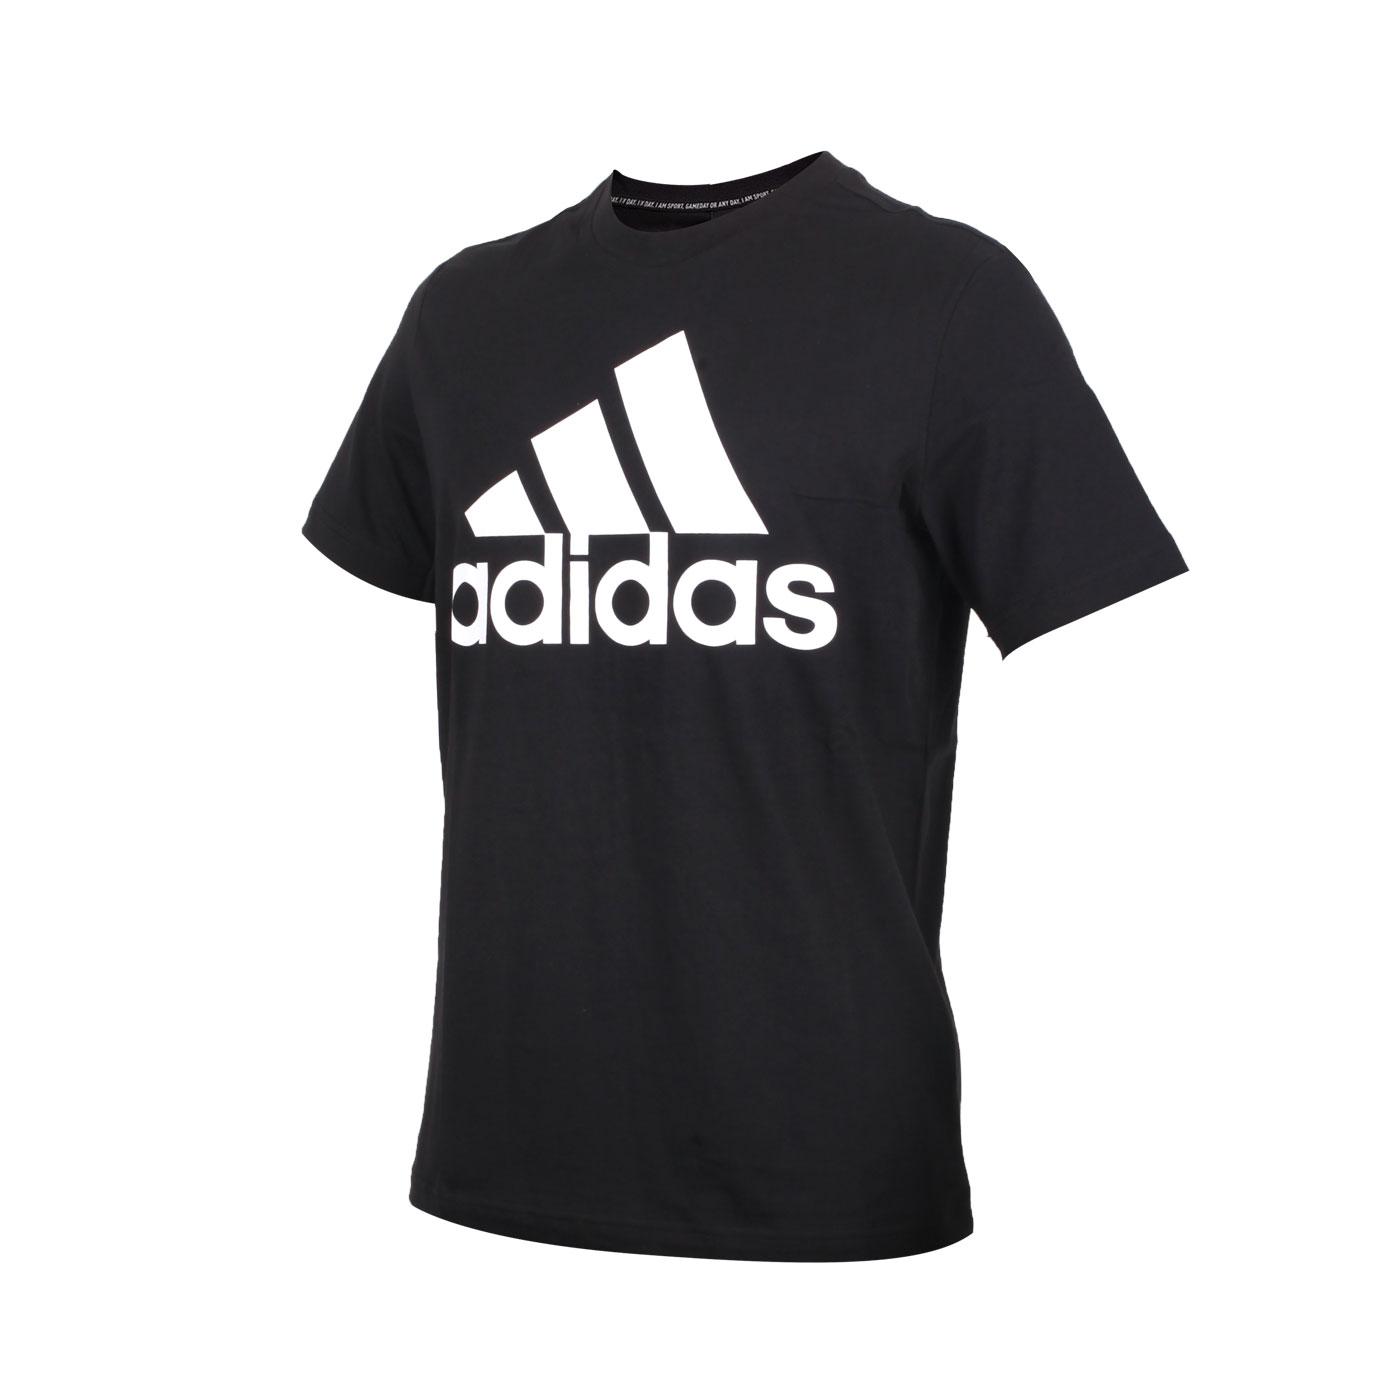 ADIDAS 男款短袖T恤 GC7346